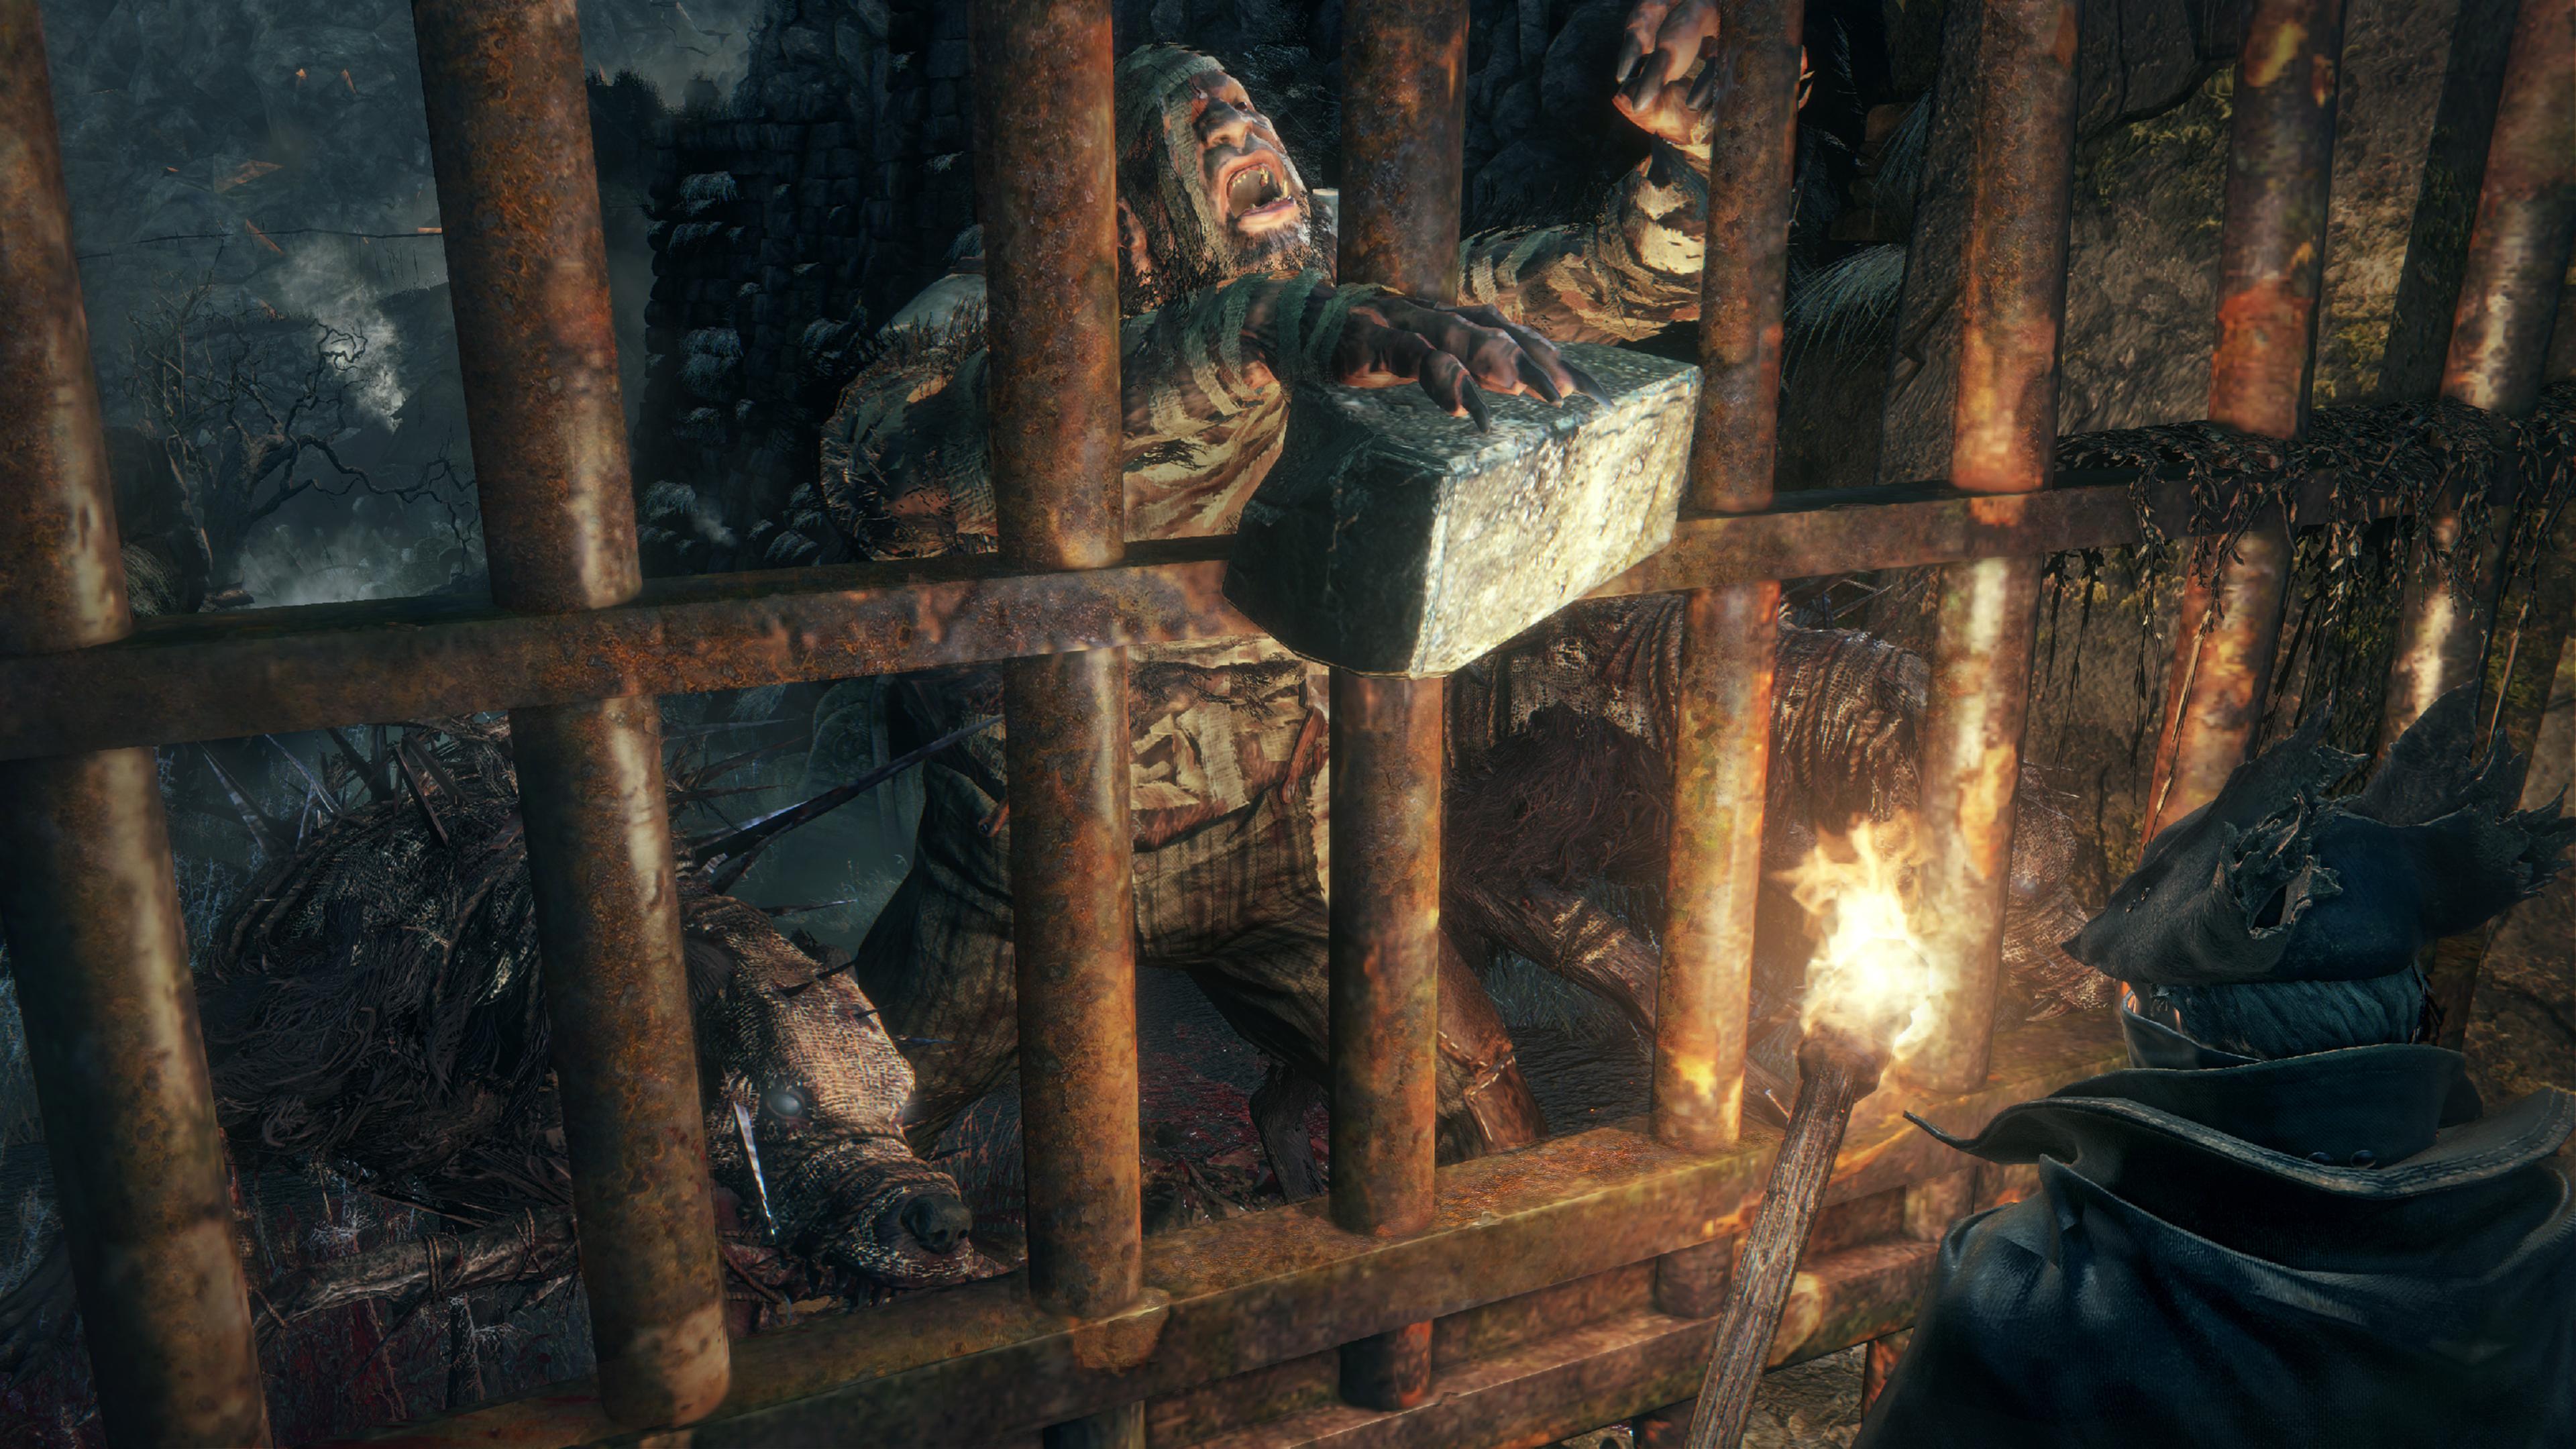 bloodborne gamescom gameplay and screenshots rpg site